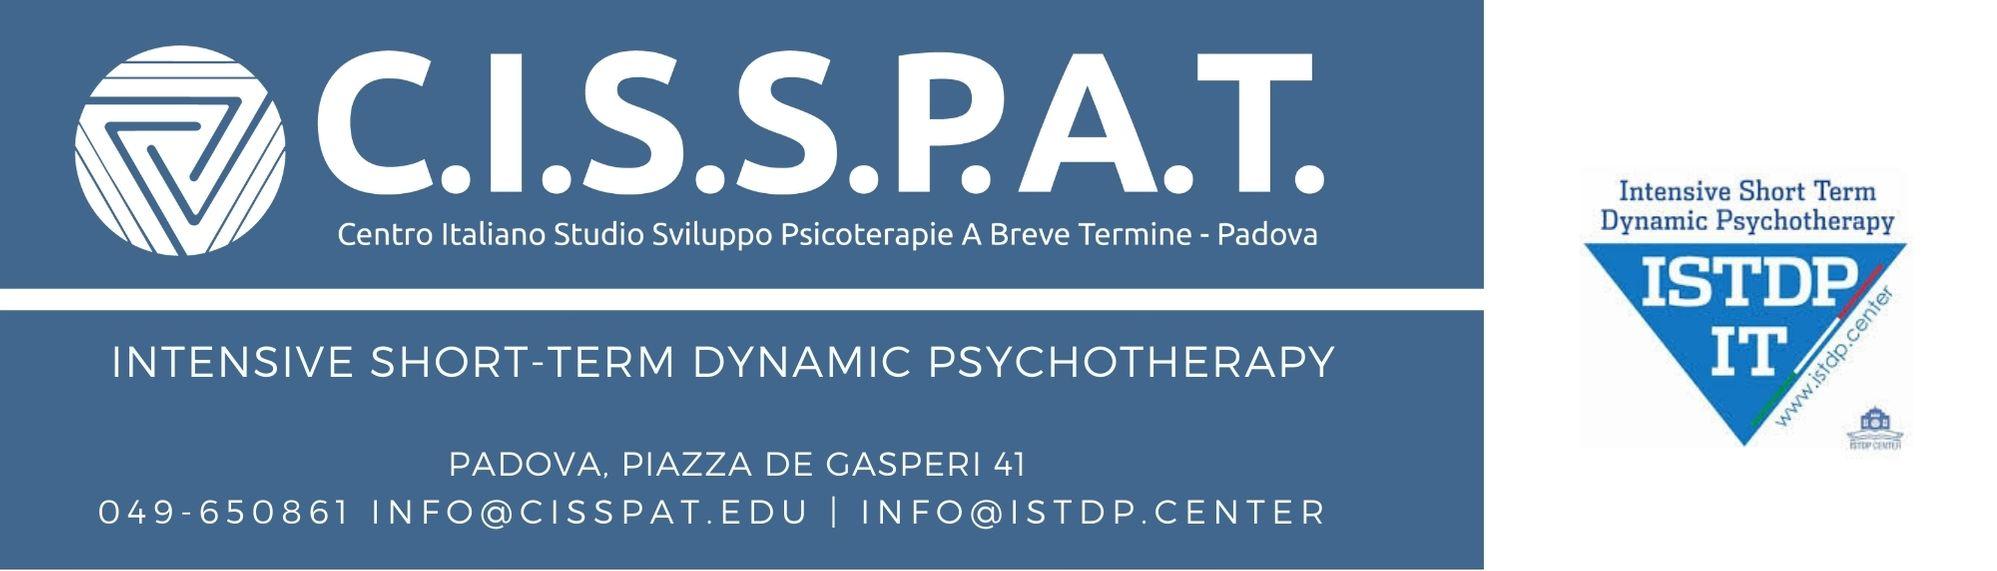 istdp cissapt center